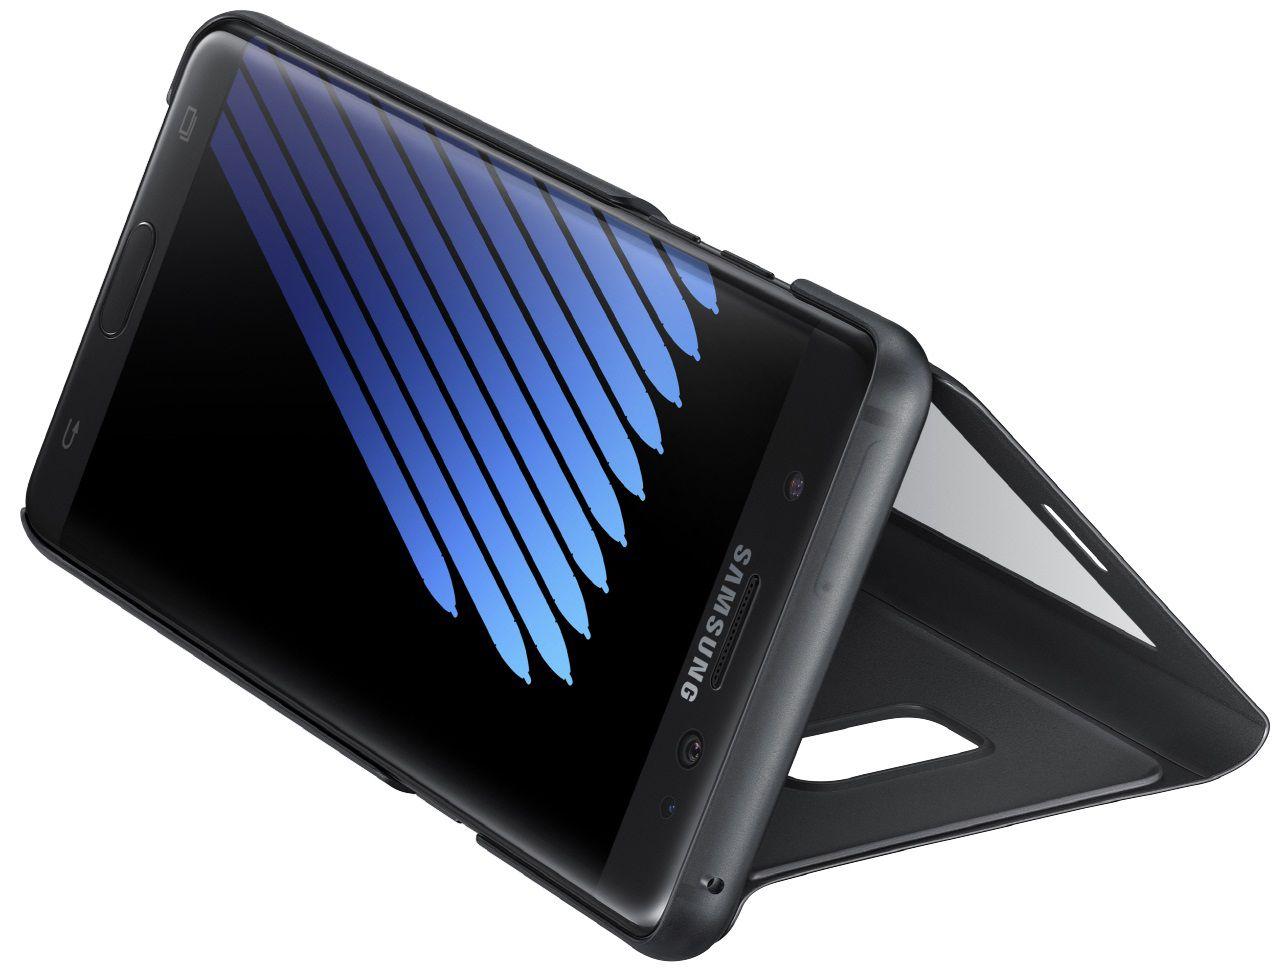 Capa Original Samsung S view Galaxy Note 7 SM-N930 Preta - Preta